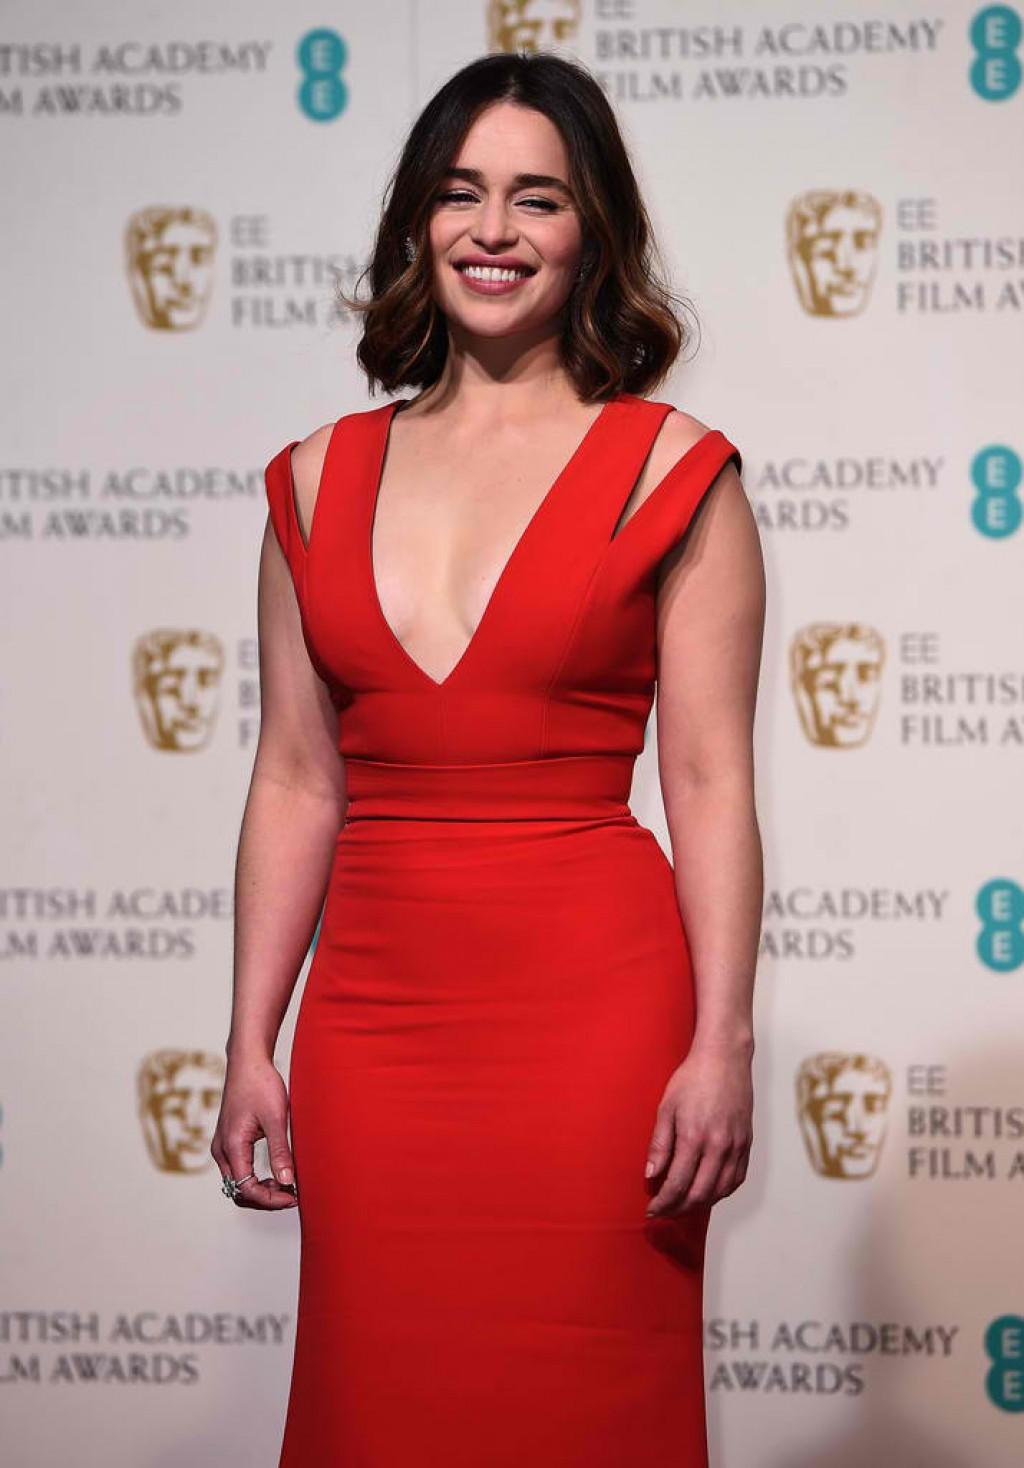 EE-British-Academy-Film-Awards-Emilia-Clarke-Face-1024x1468